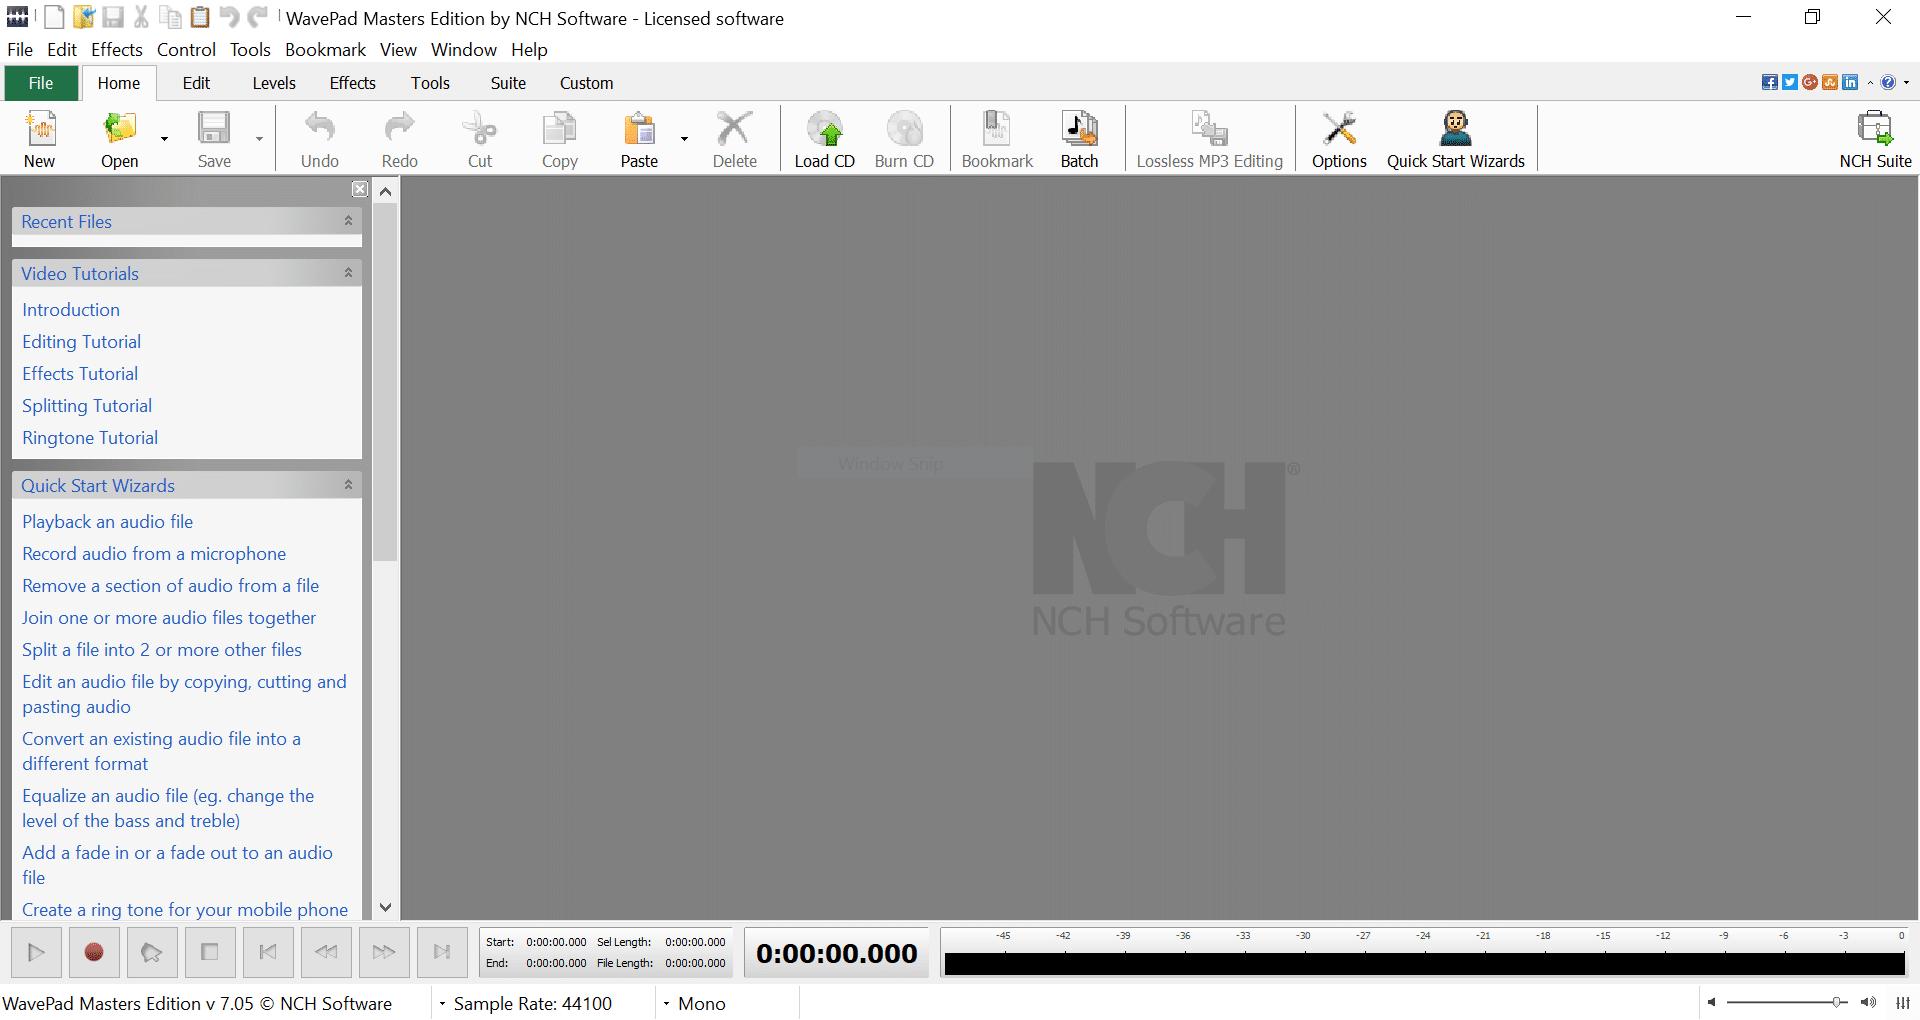 www piratecity co/wp-content/uploads/2017/08/NCH-W